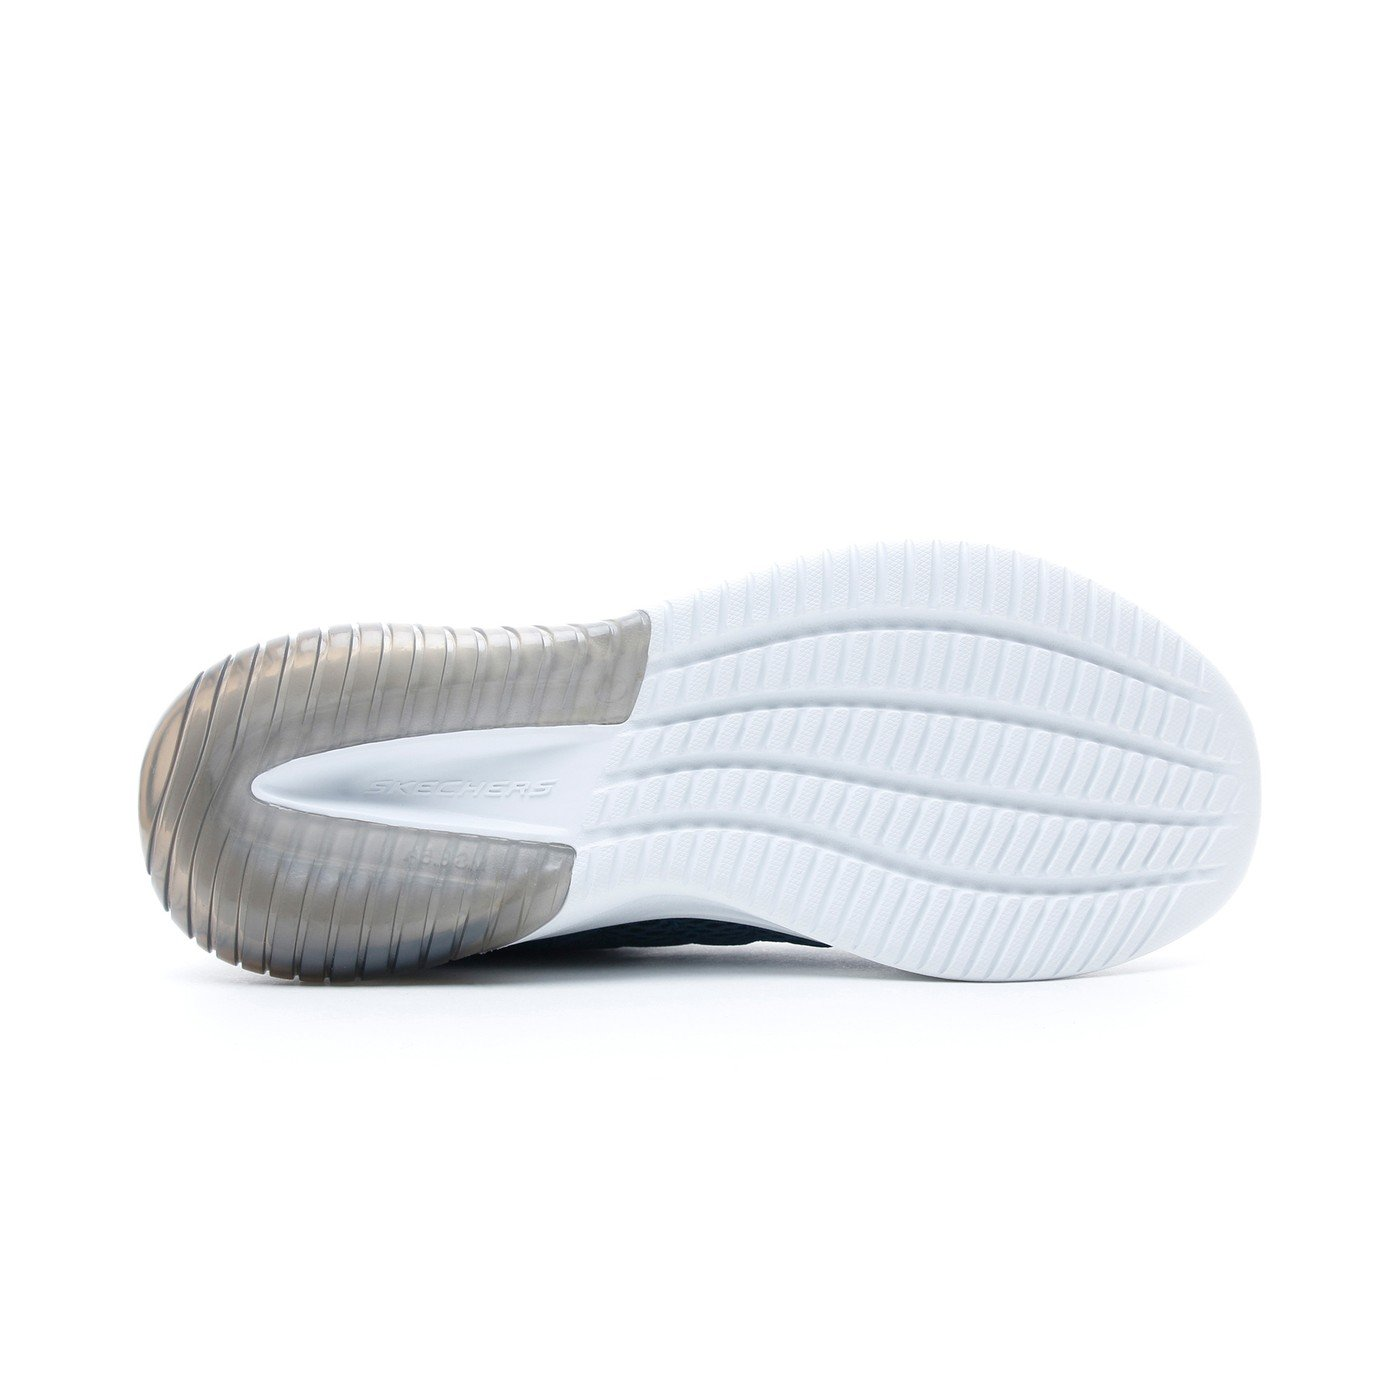 Skechers Skech Air Ultra Flex - Orburn Erkek Lacivert Spor Ayakkabı